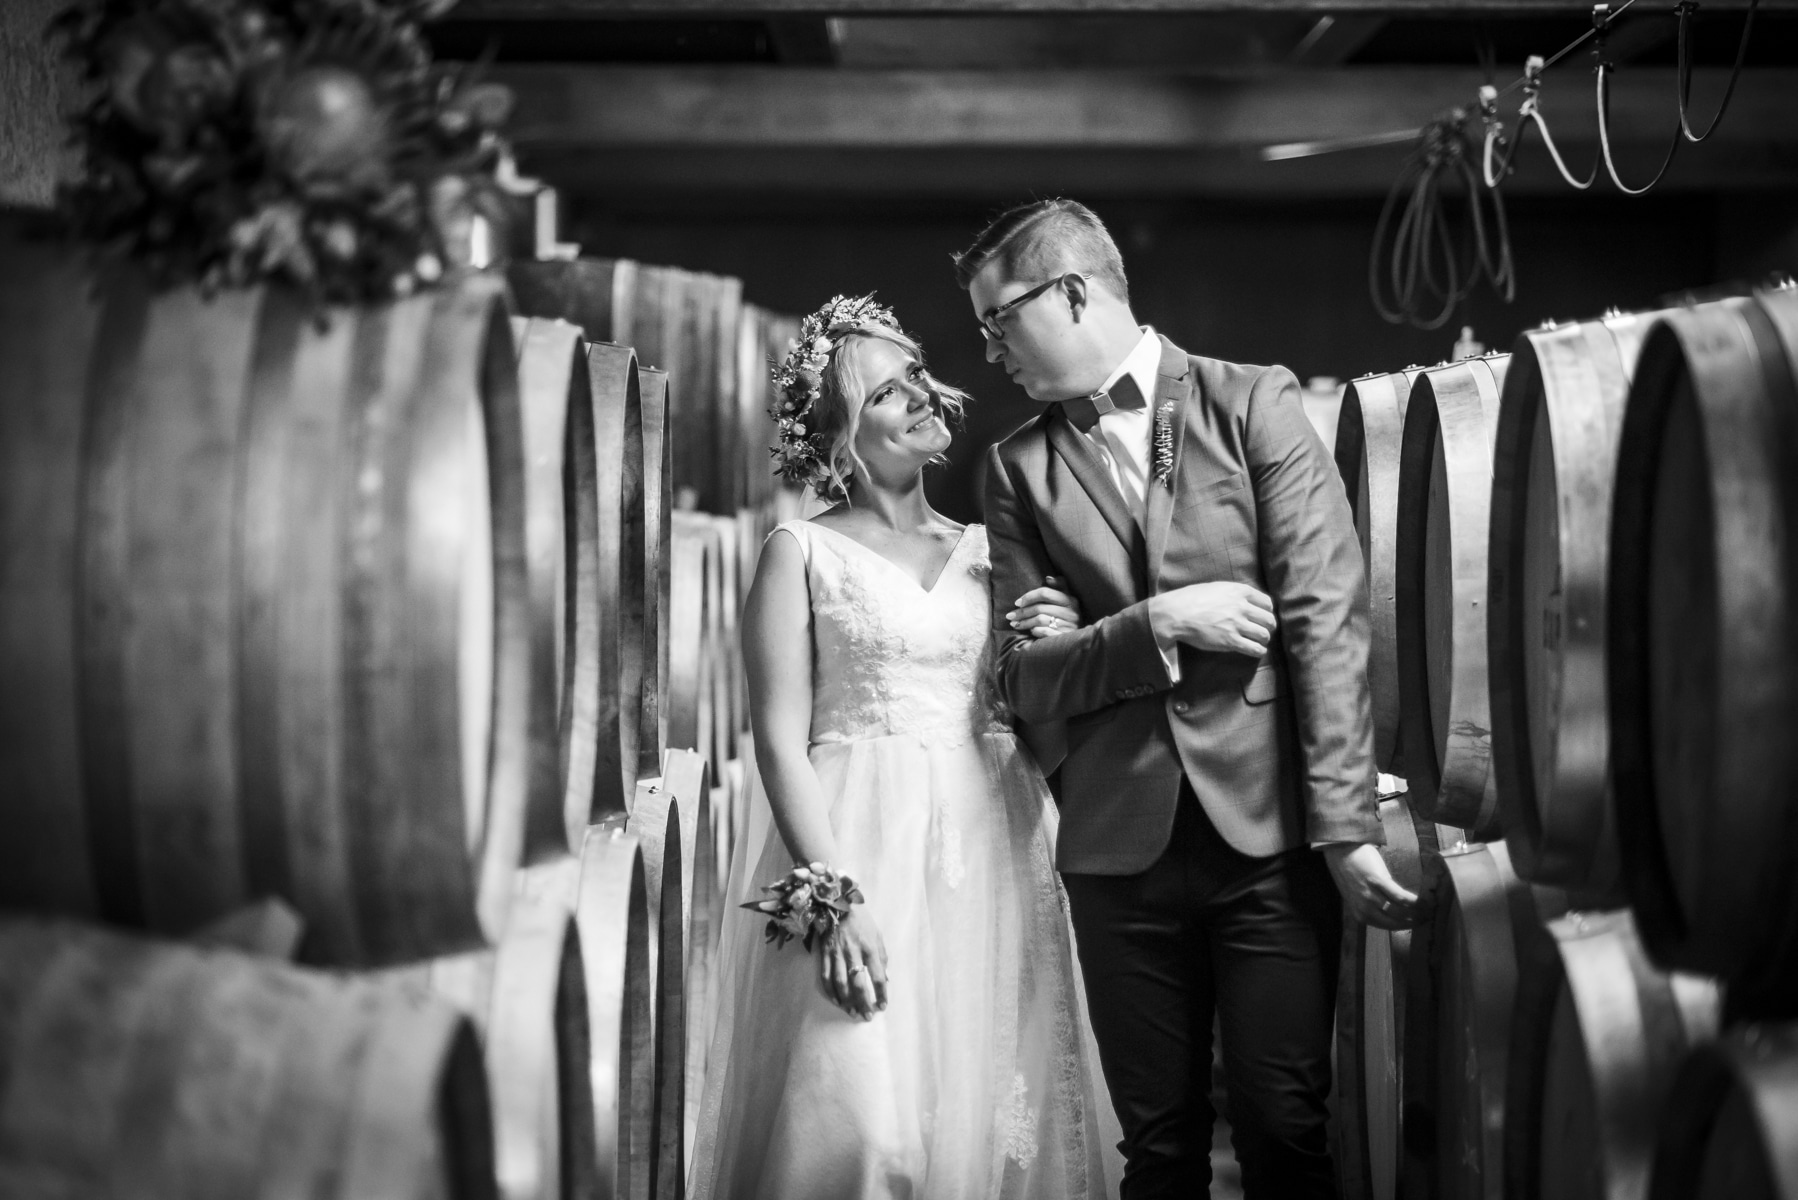 cupitts wedding